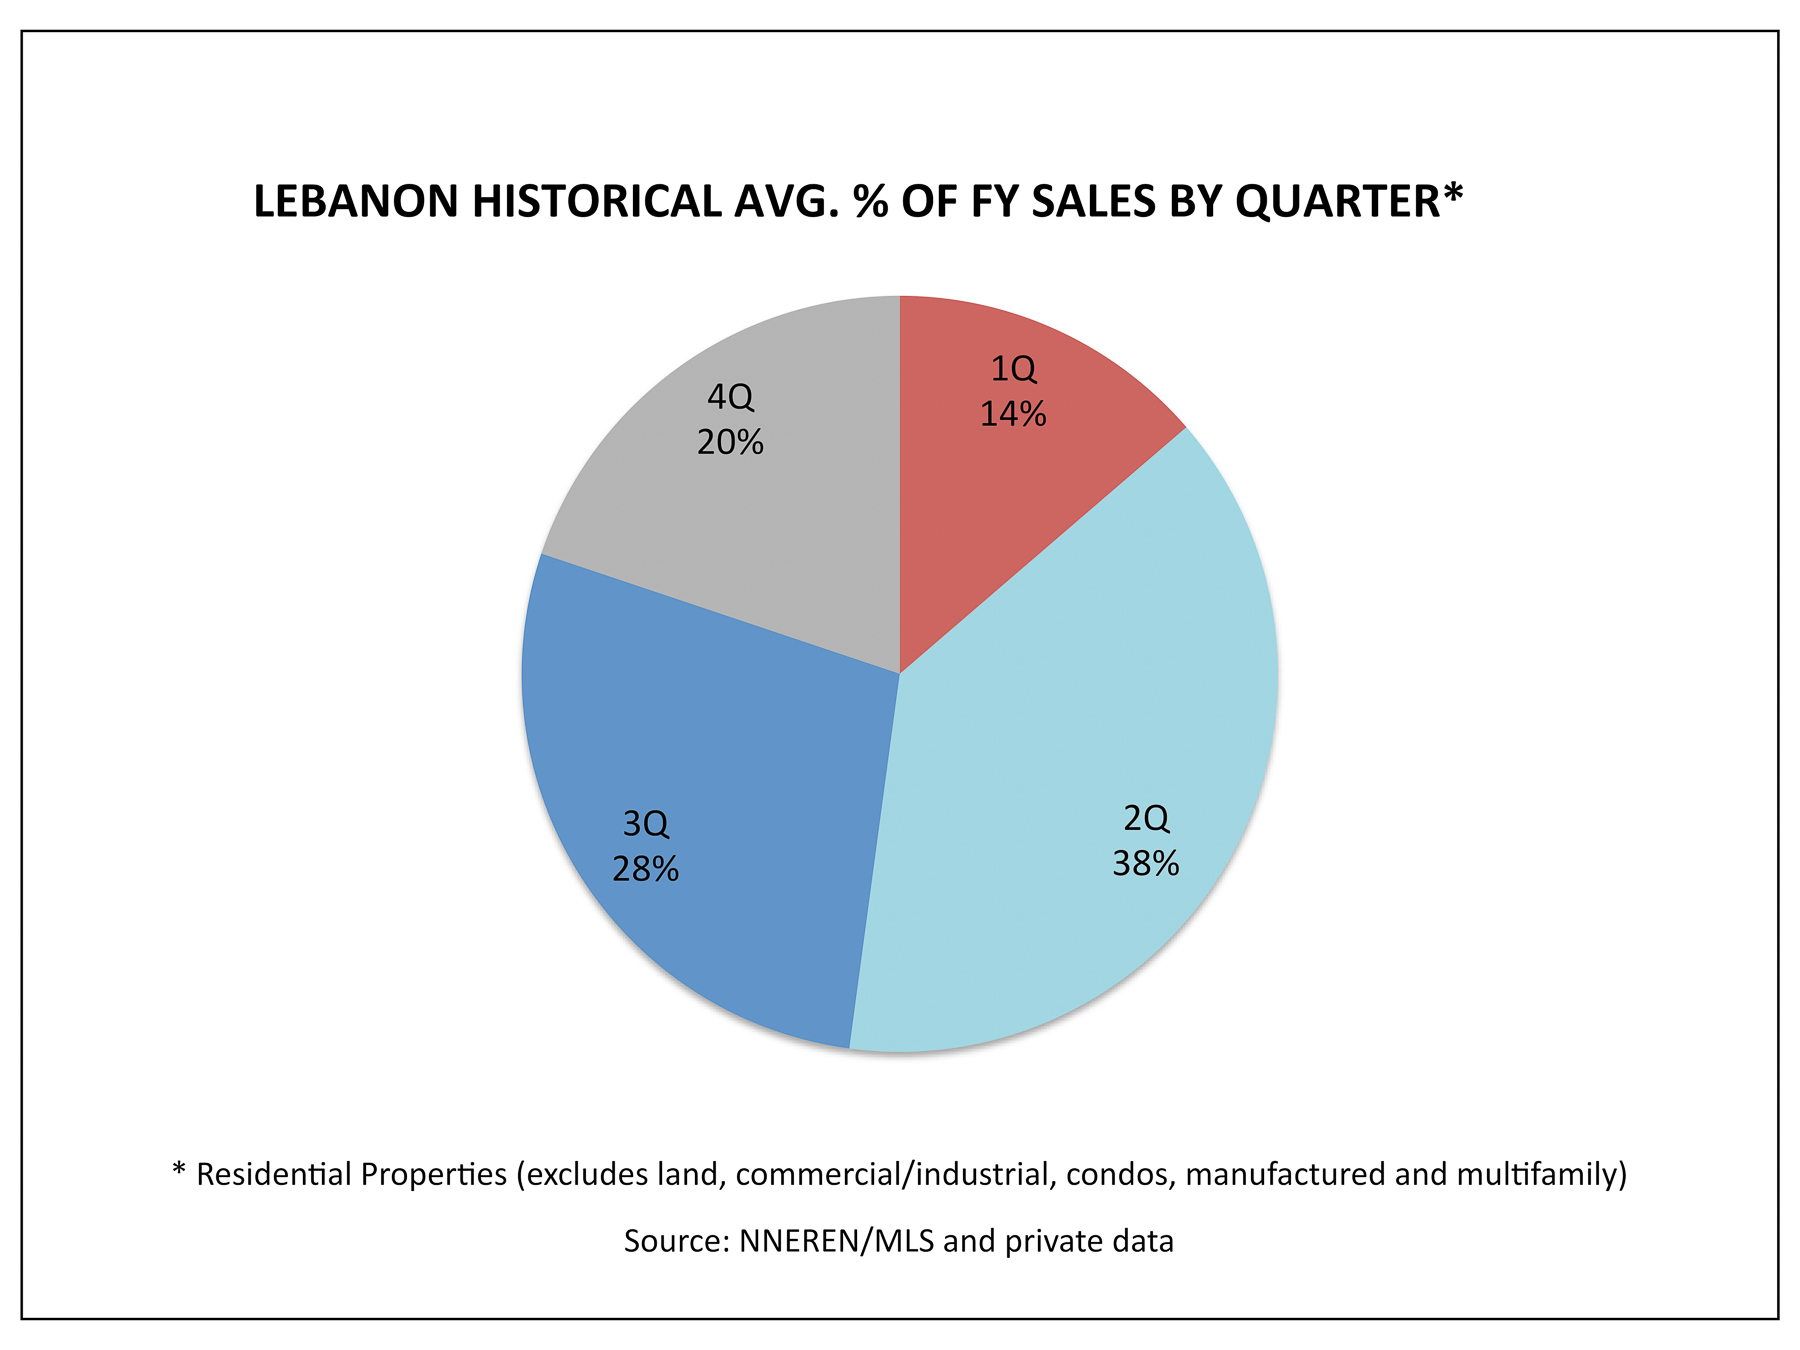 861d54967b4b0 Lebanon NH Real Estate Market - 1Q Historical Avg % Homes Sold by Quarter